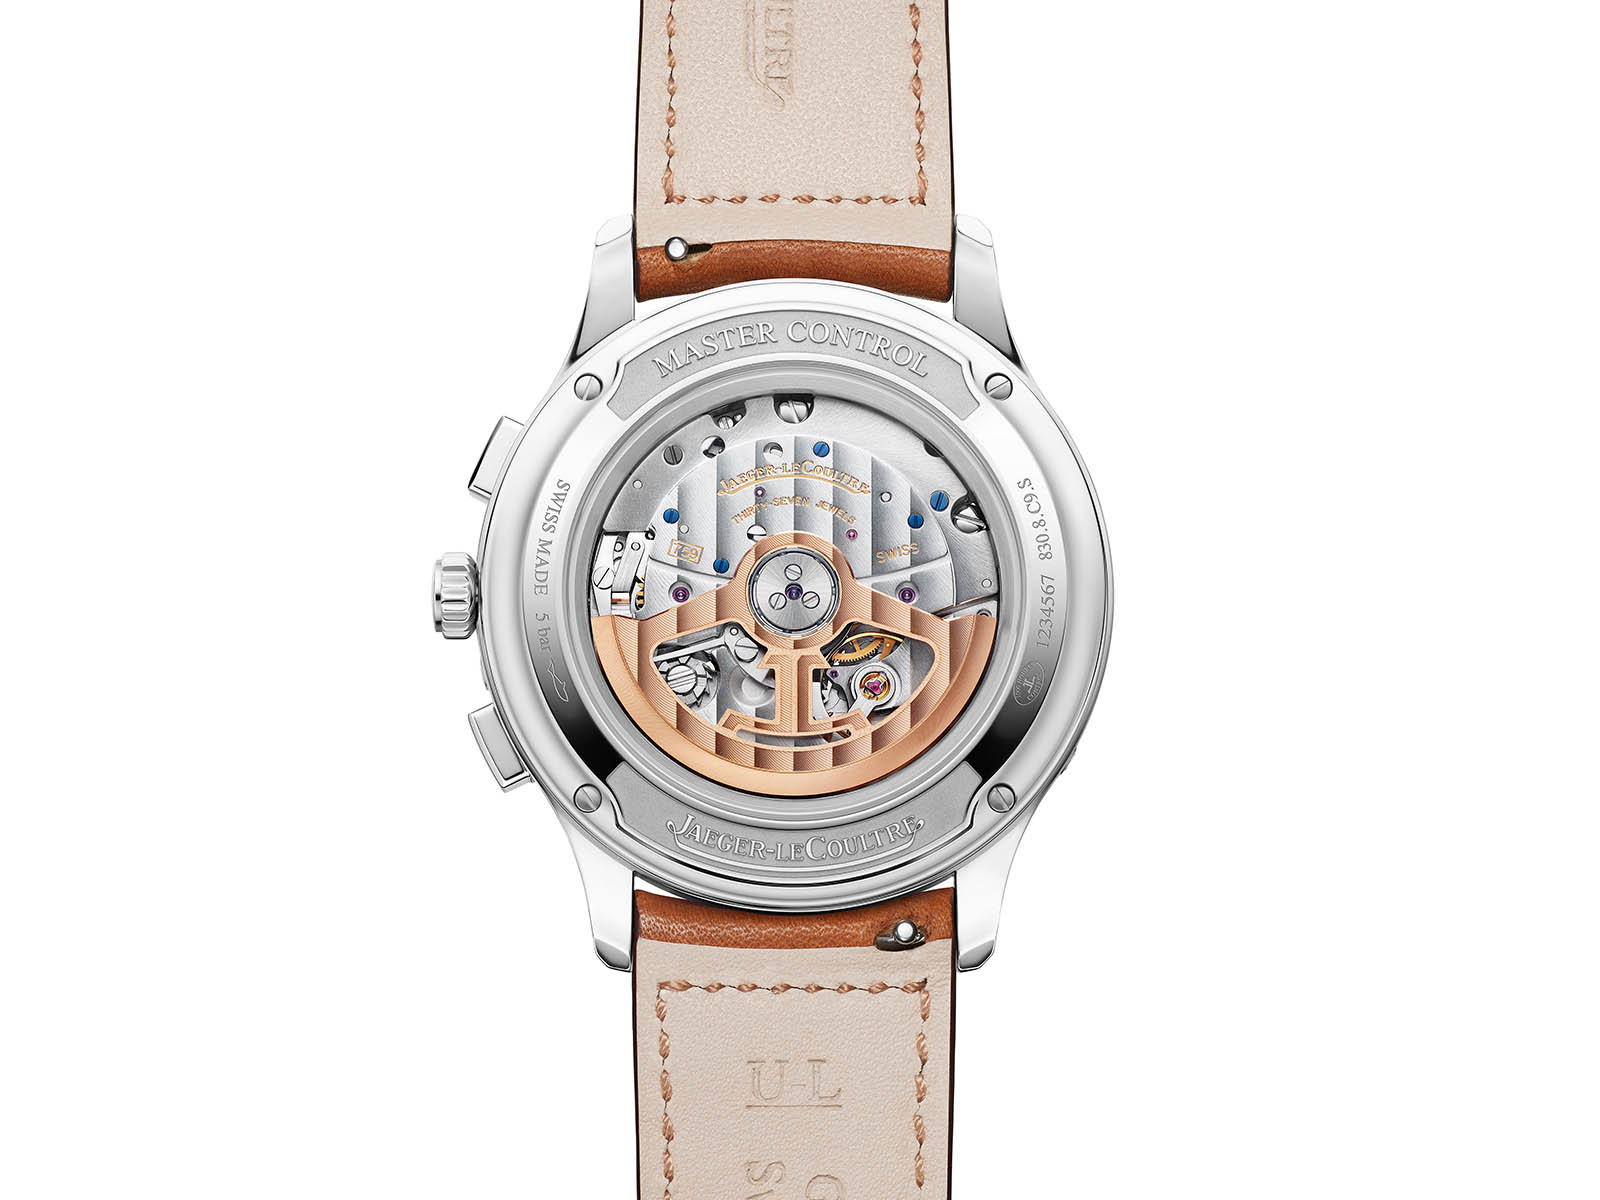 q4138420-jaeger-lecoultre-master-control-chronograph-calendar-3.jpg